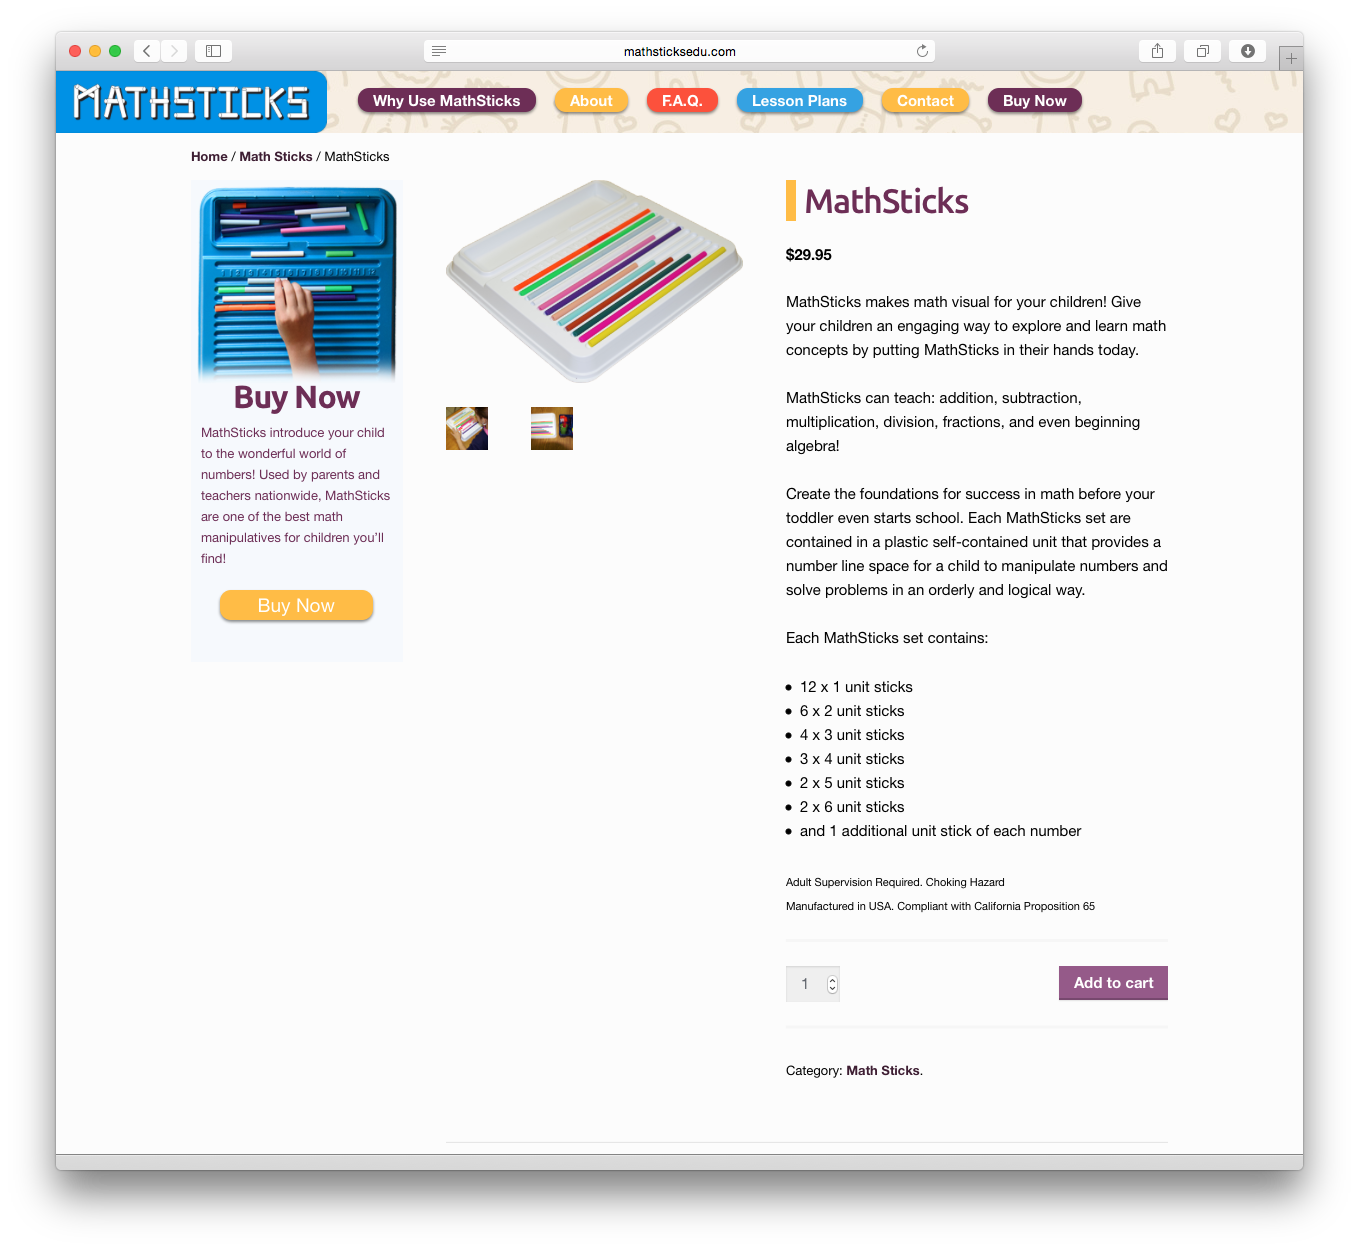 WooCommerce Product Integration